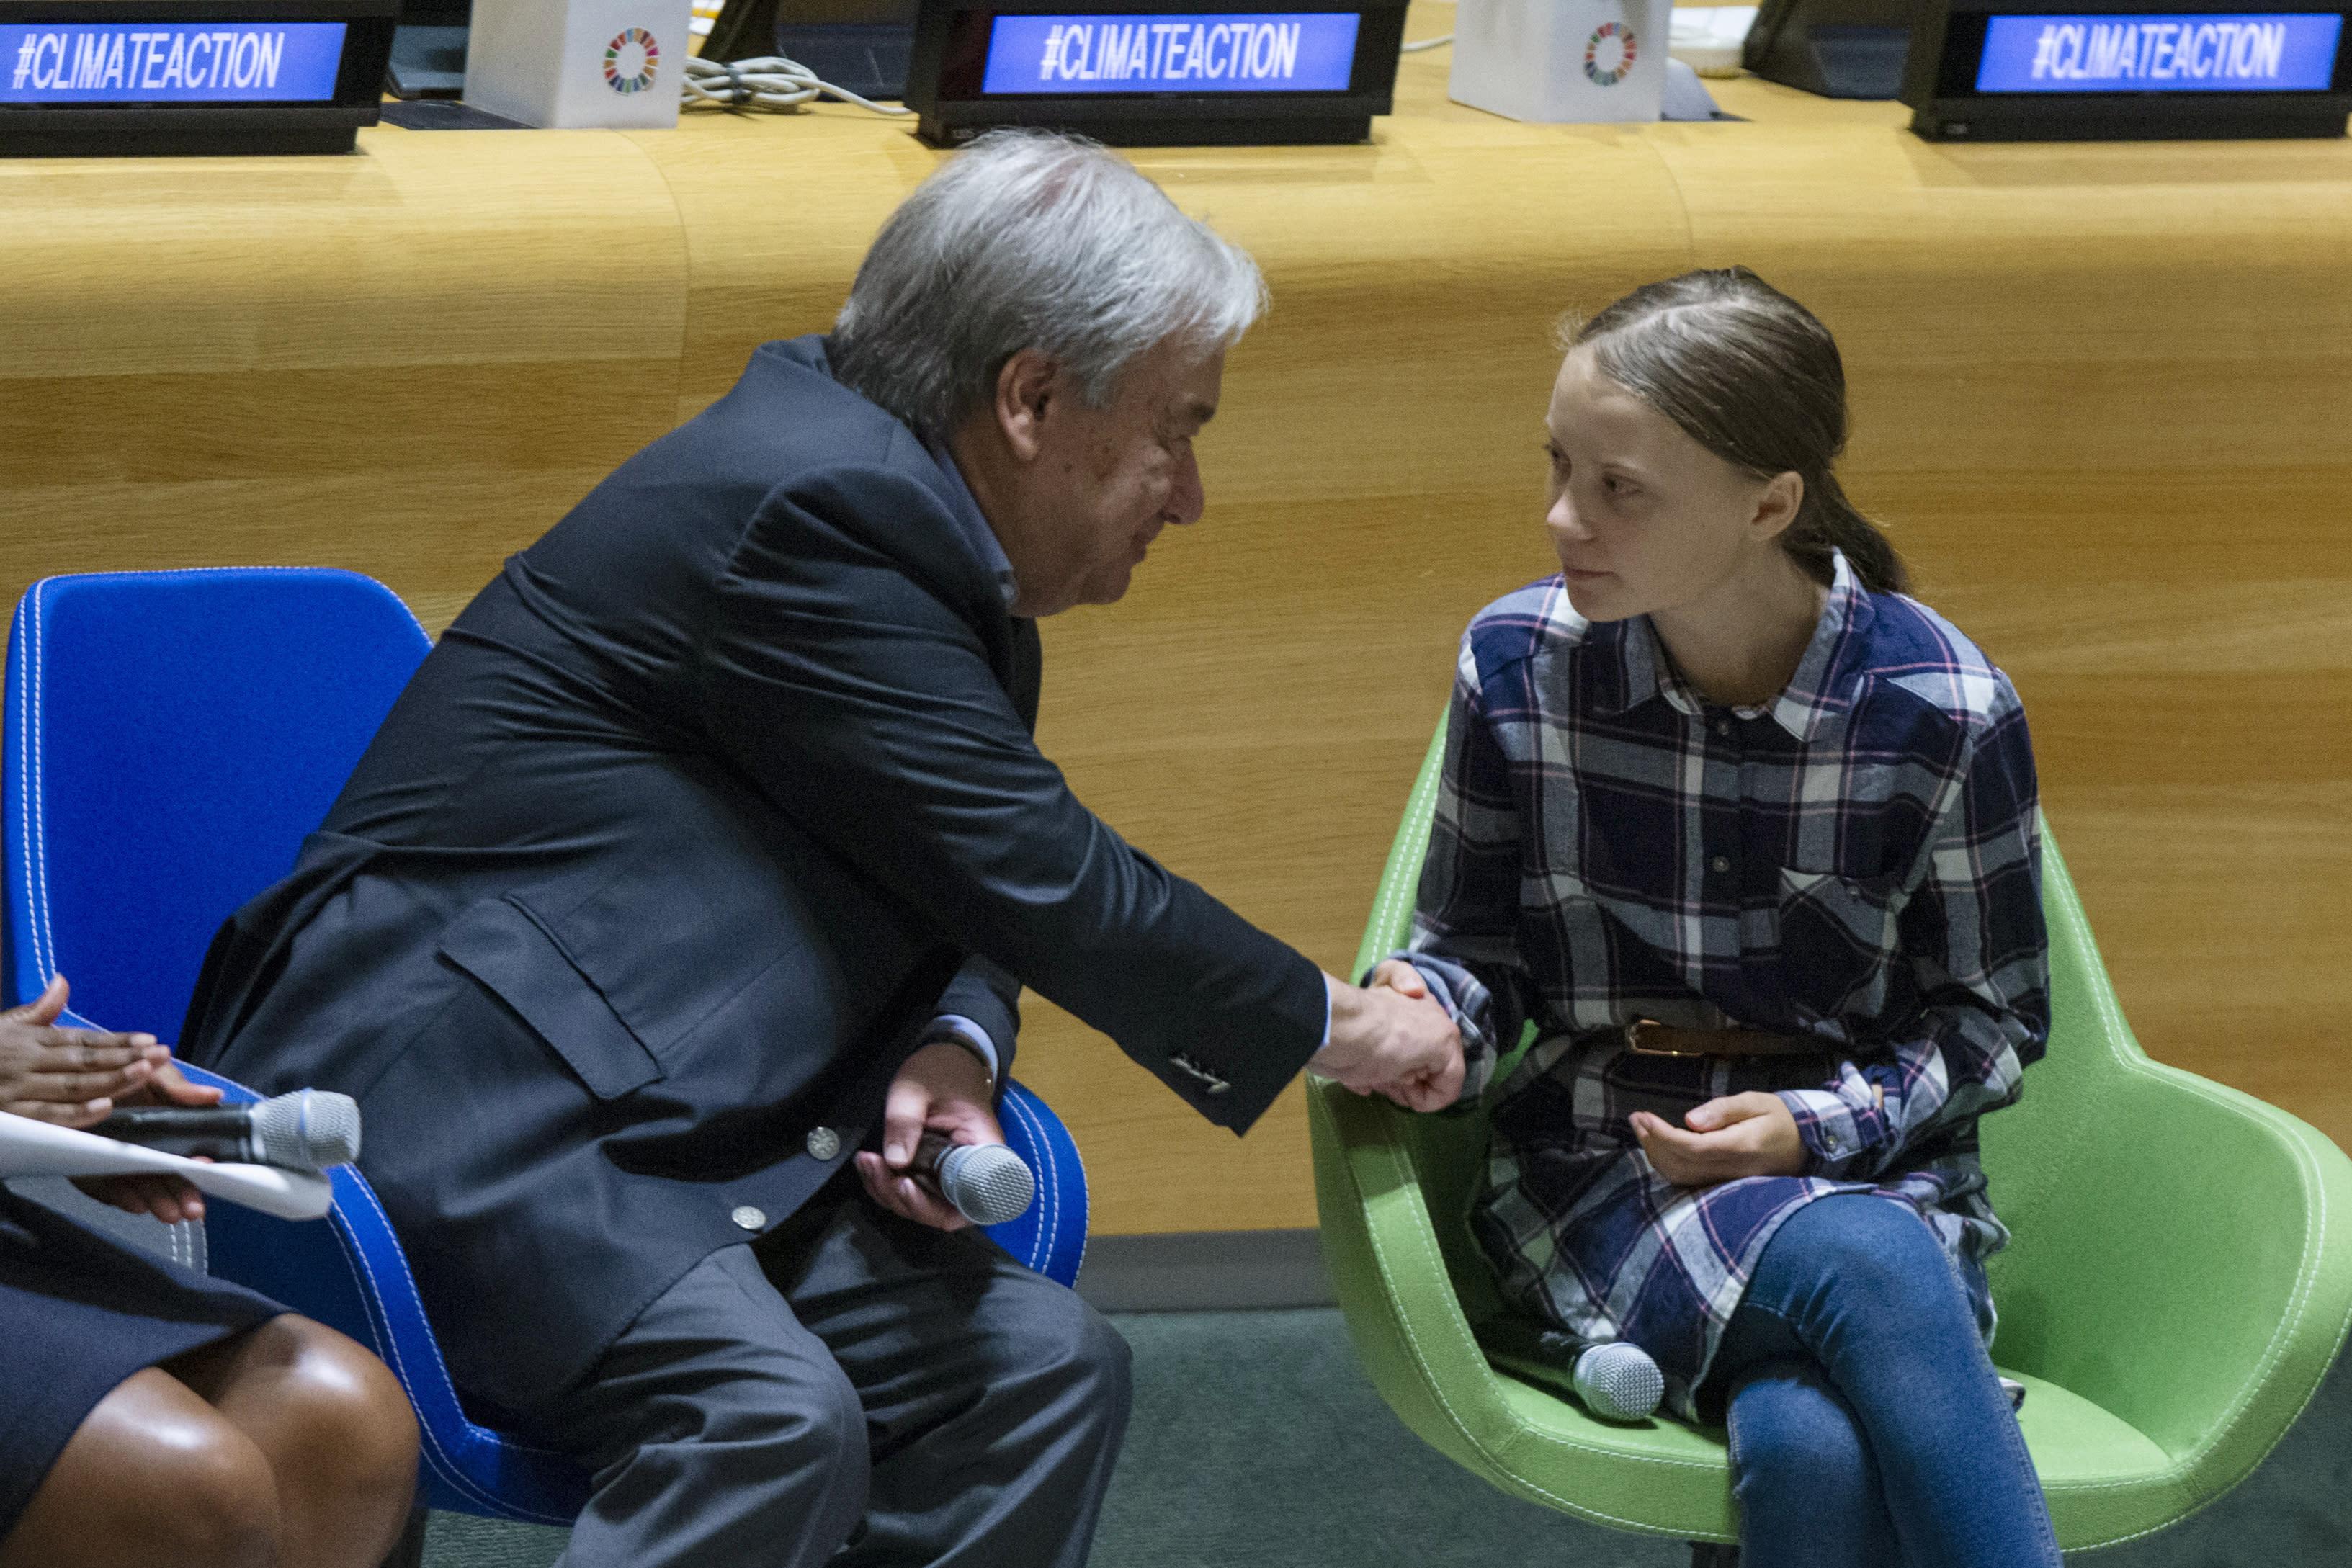 Swedish environmental activist Greta Thunberg, right, shakes hands with U.N. Secretary-General Antonio Guterres, during the Youth Climate Summit at United Nations headquarters, Saturday, Sept. 21, 2019. (AP Photo/Eduardo Munoz Alvarez)